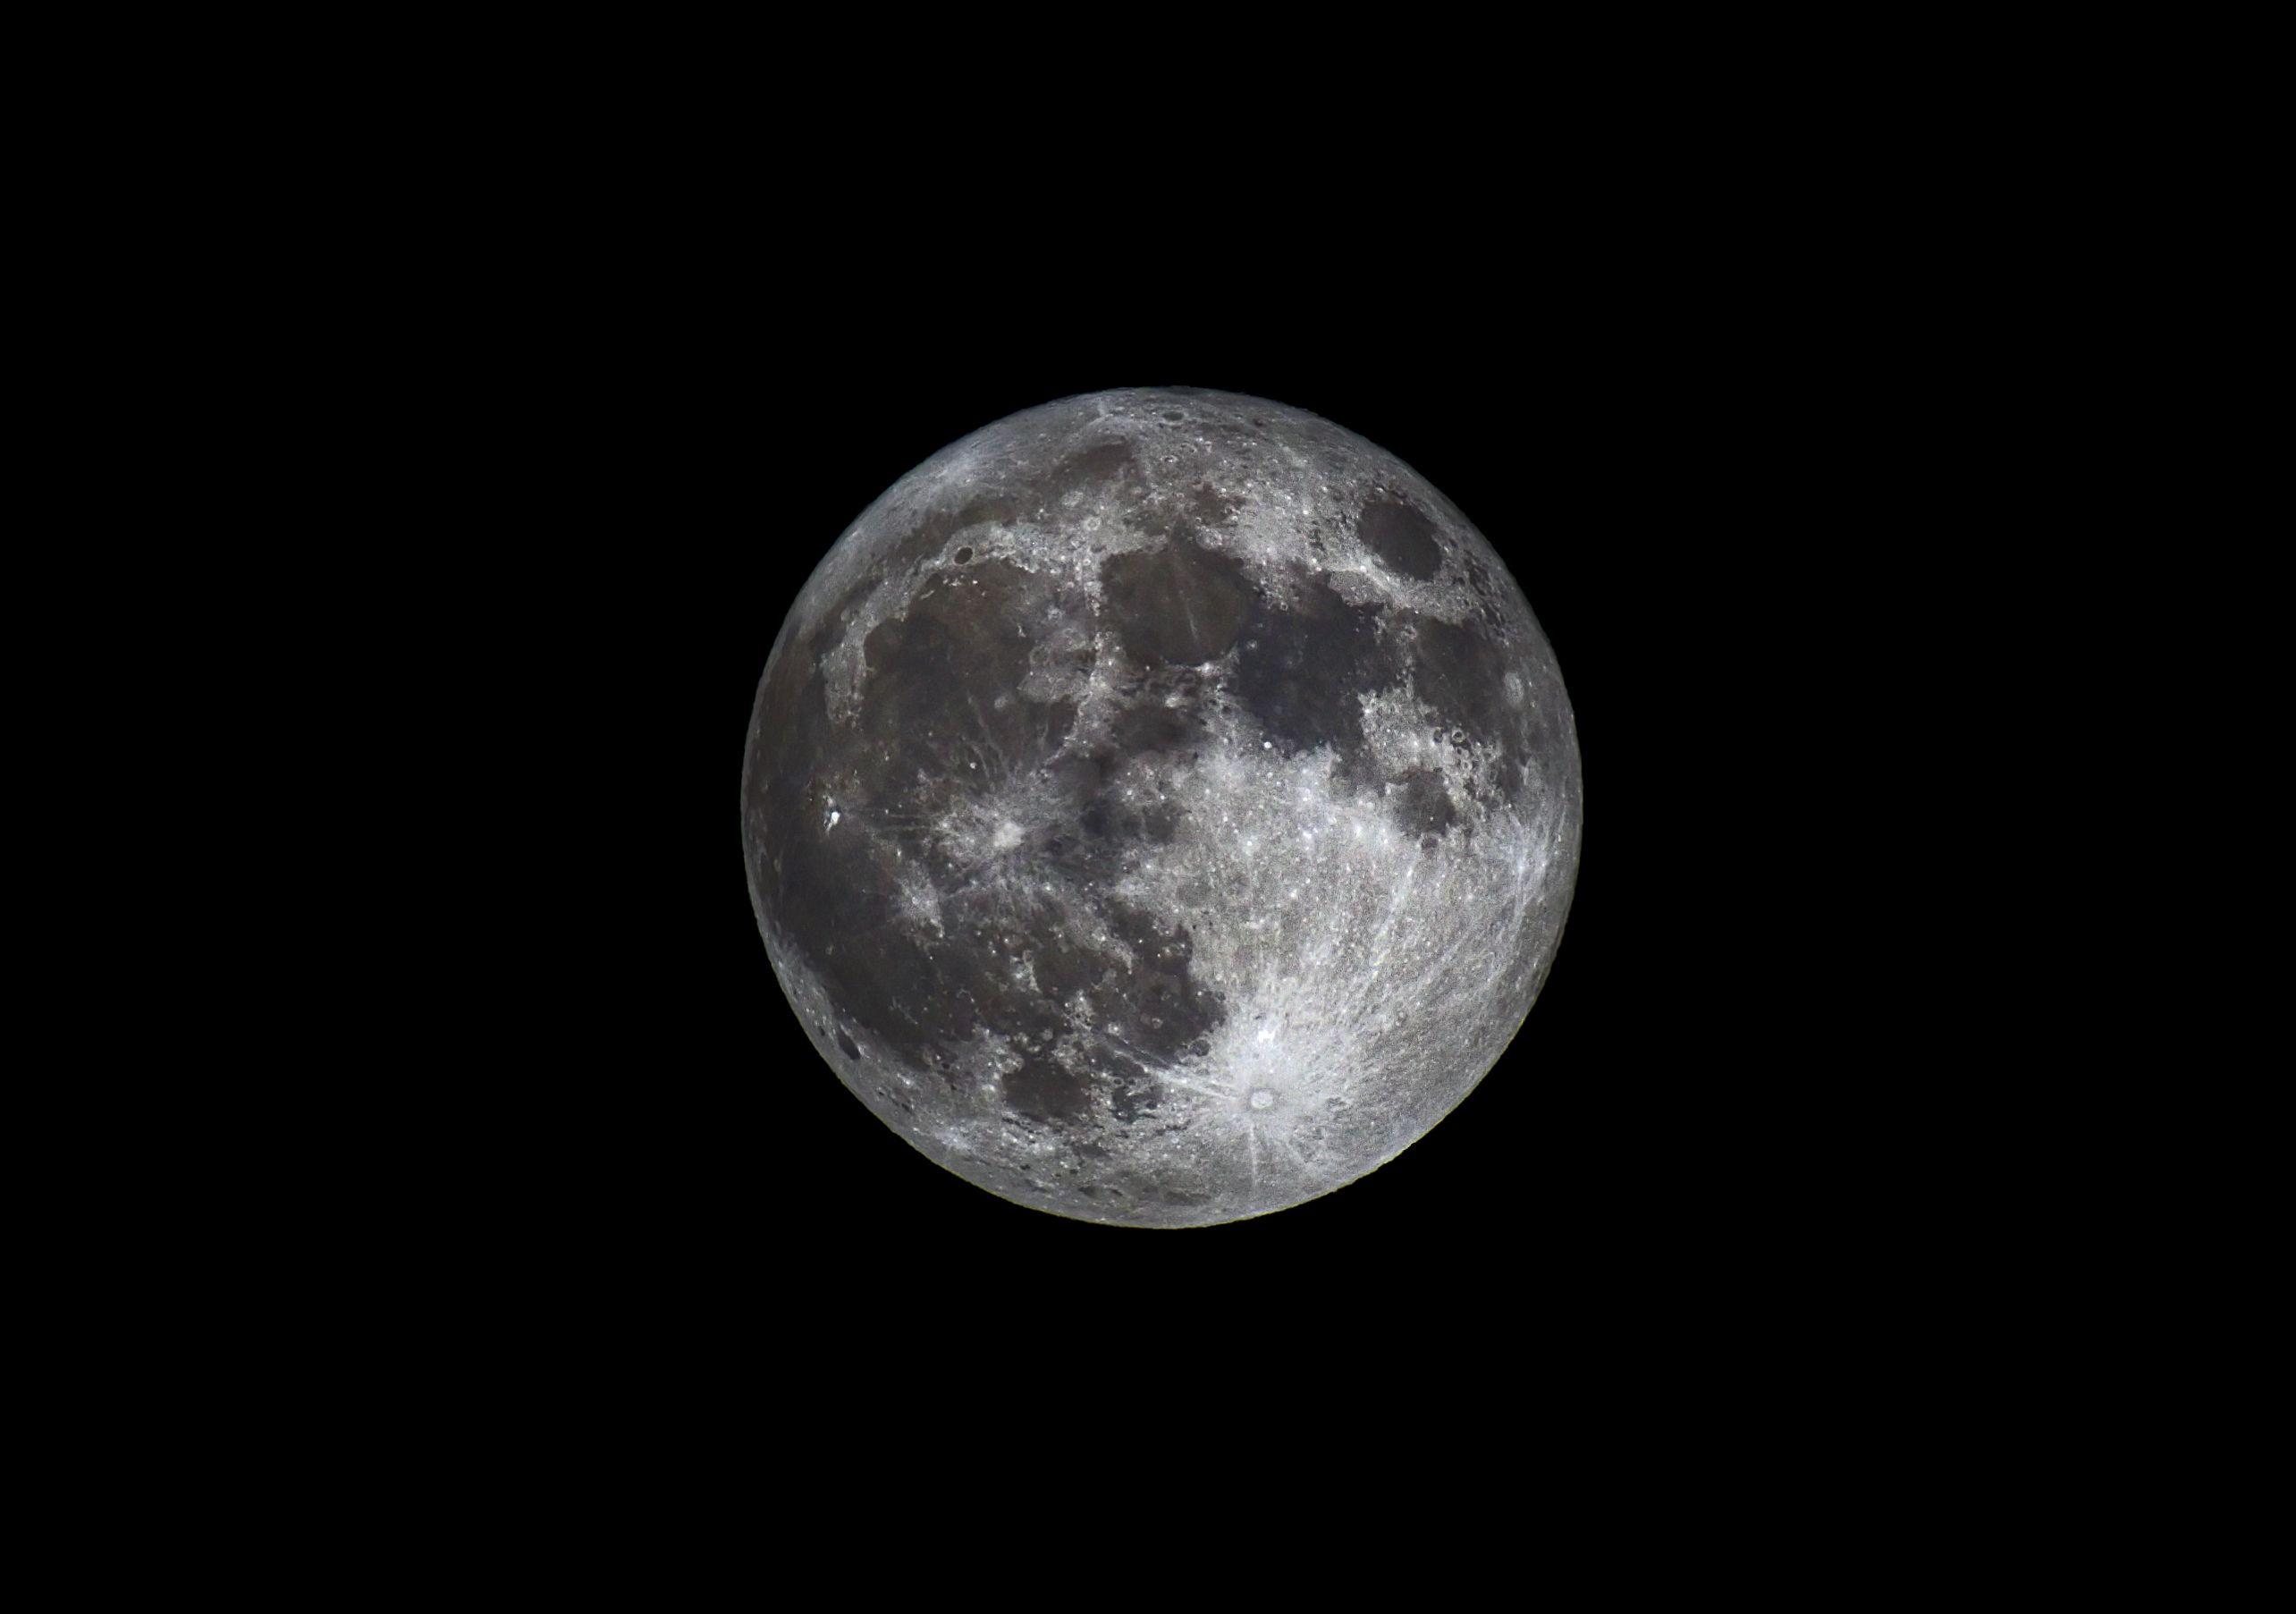 Big Full moon